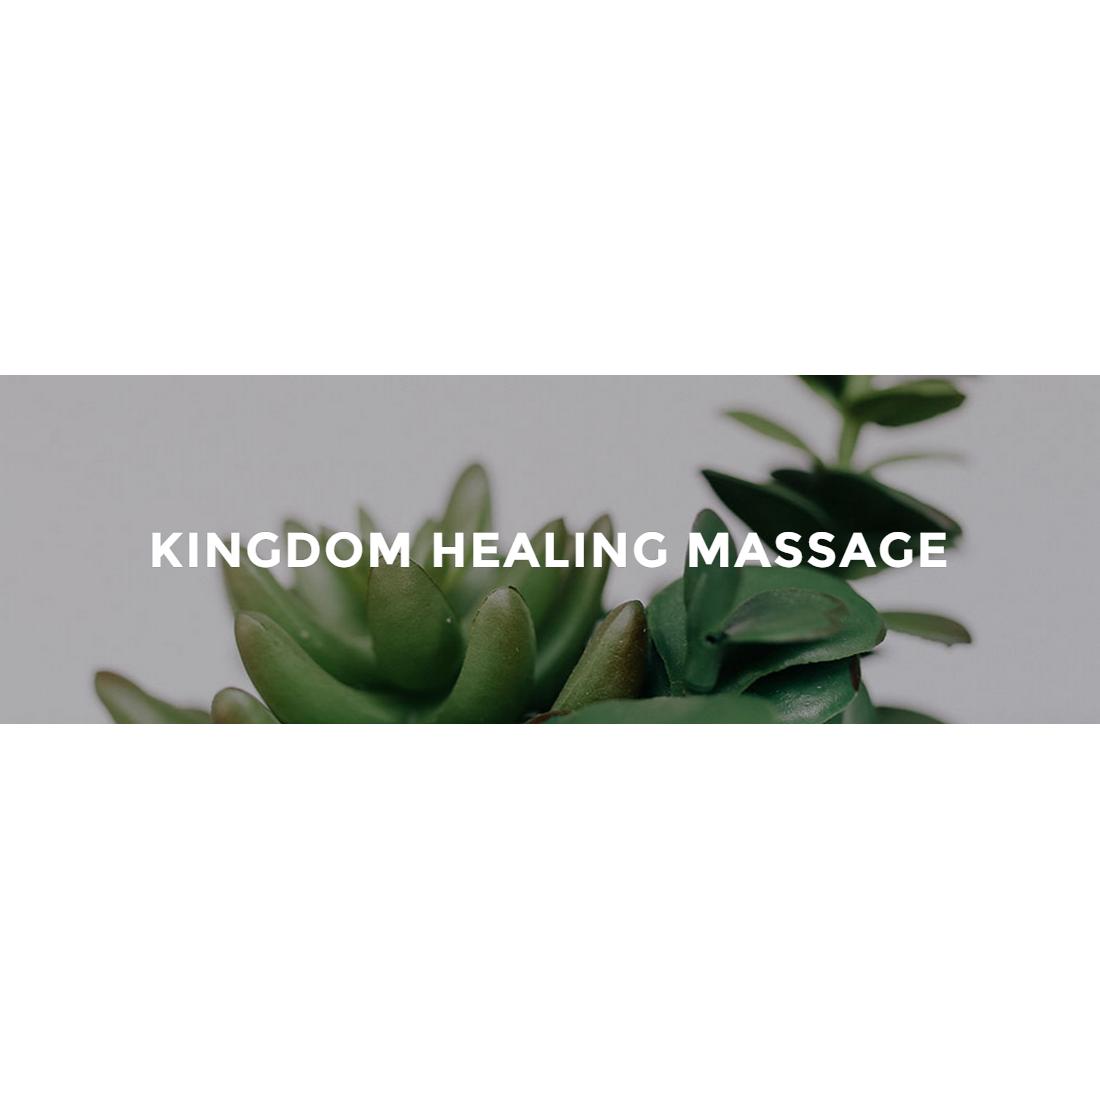 Kingdom Healing Massage